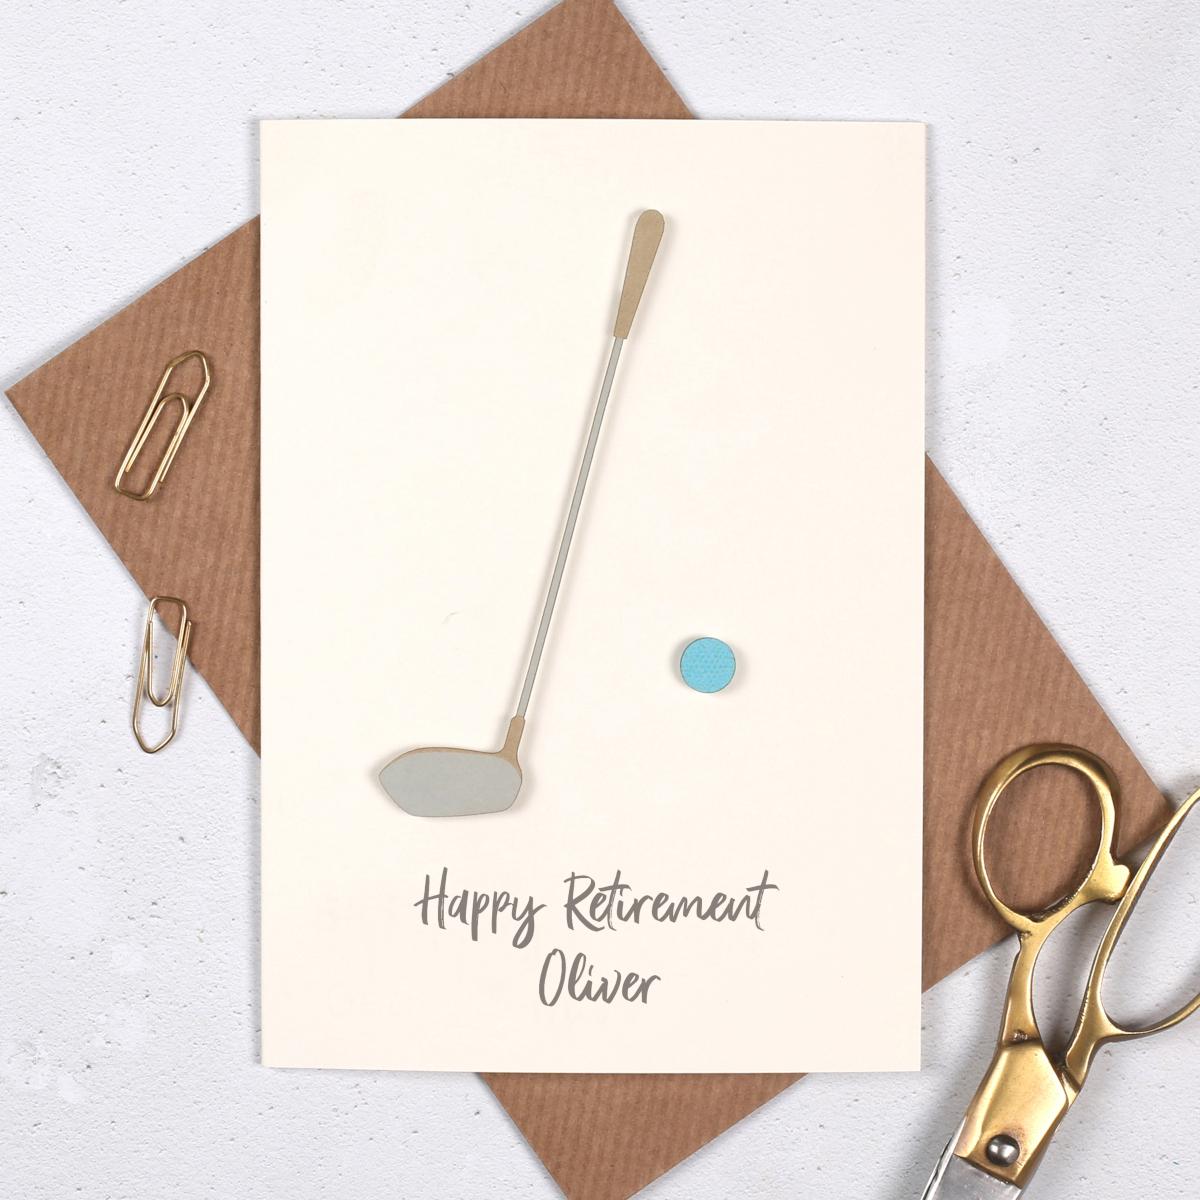 Handmade golf card, gift for golfers